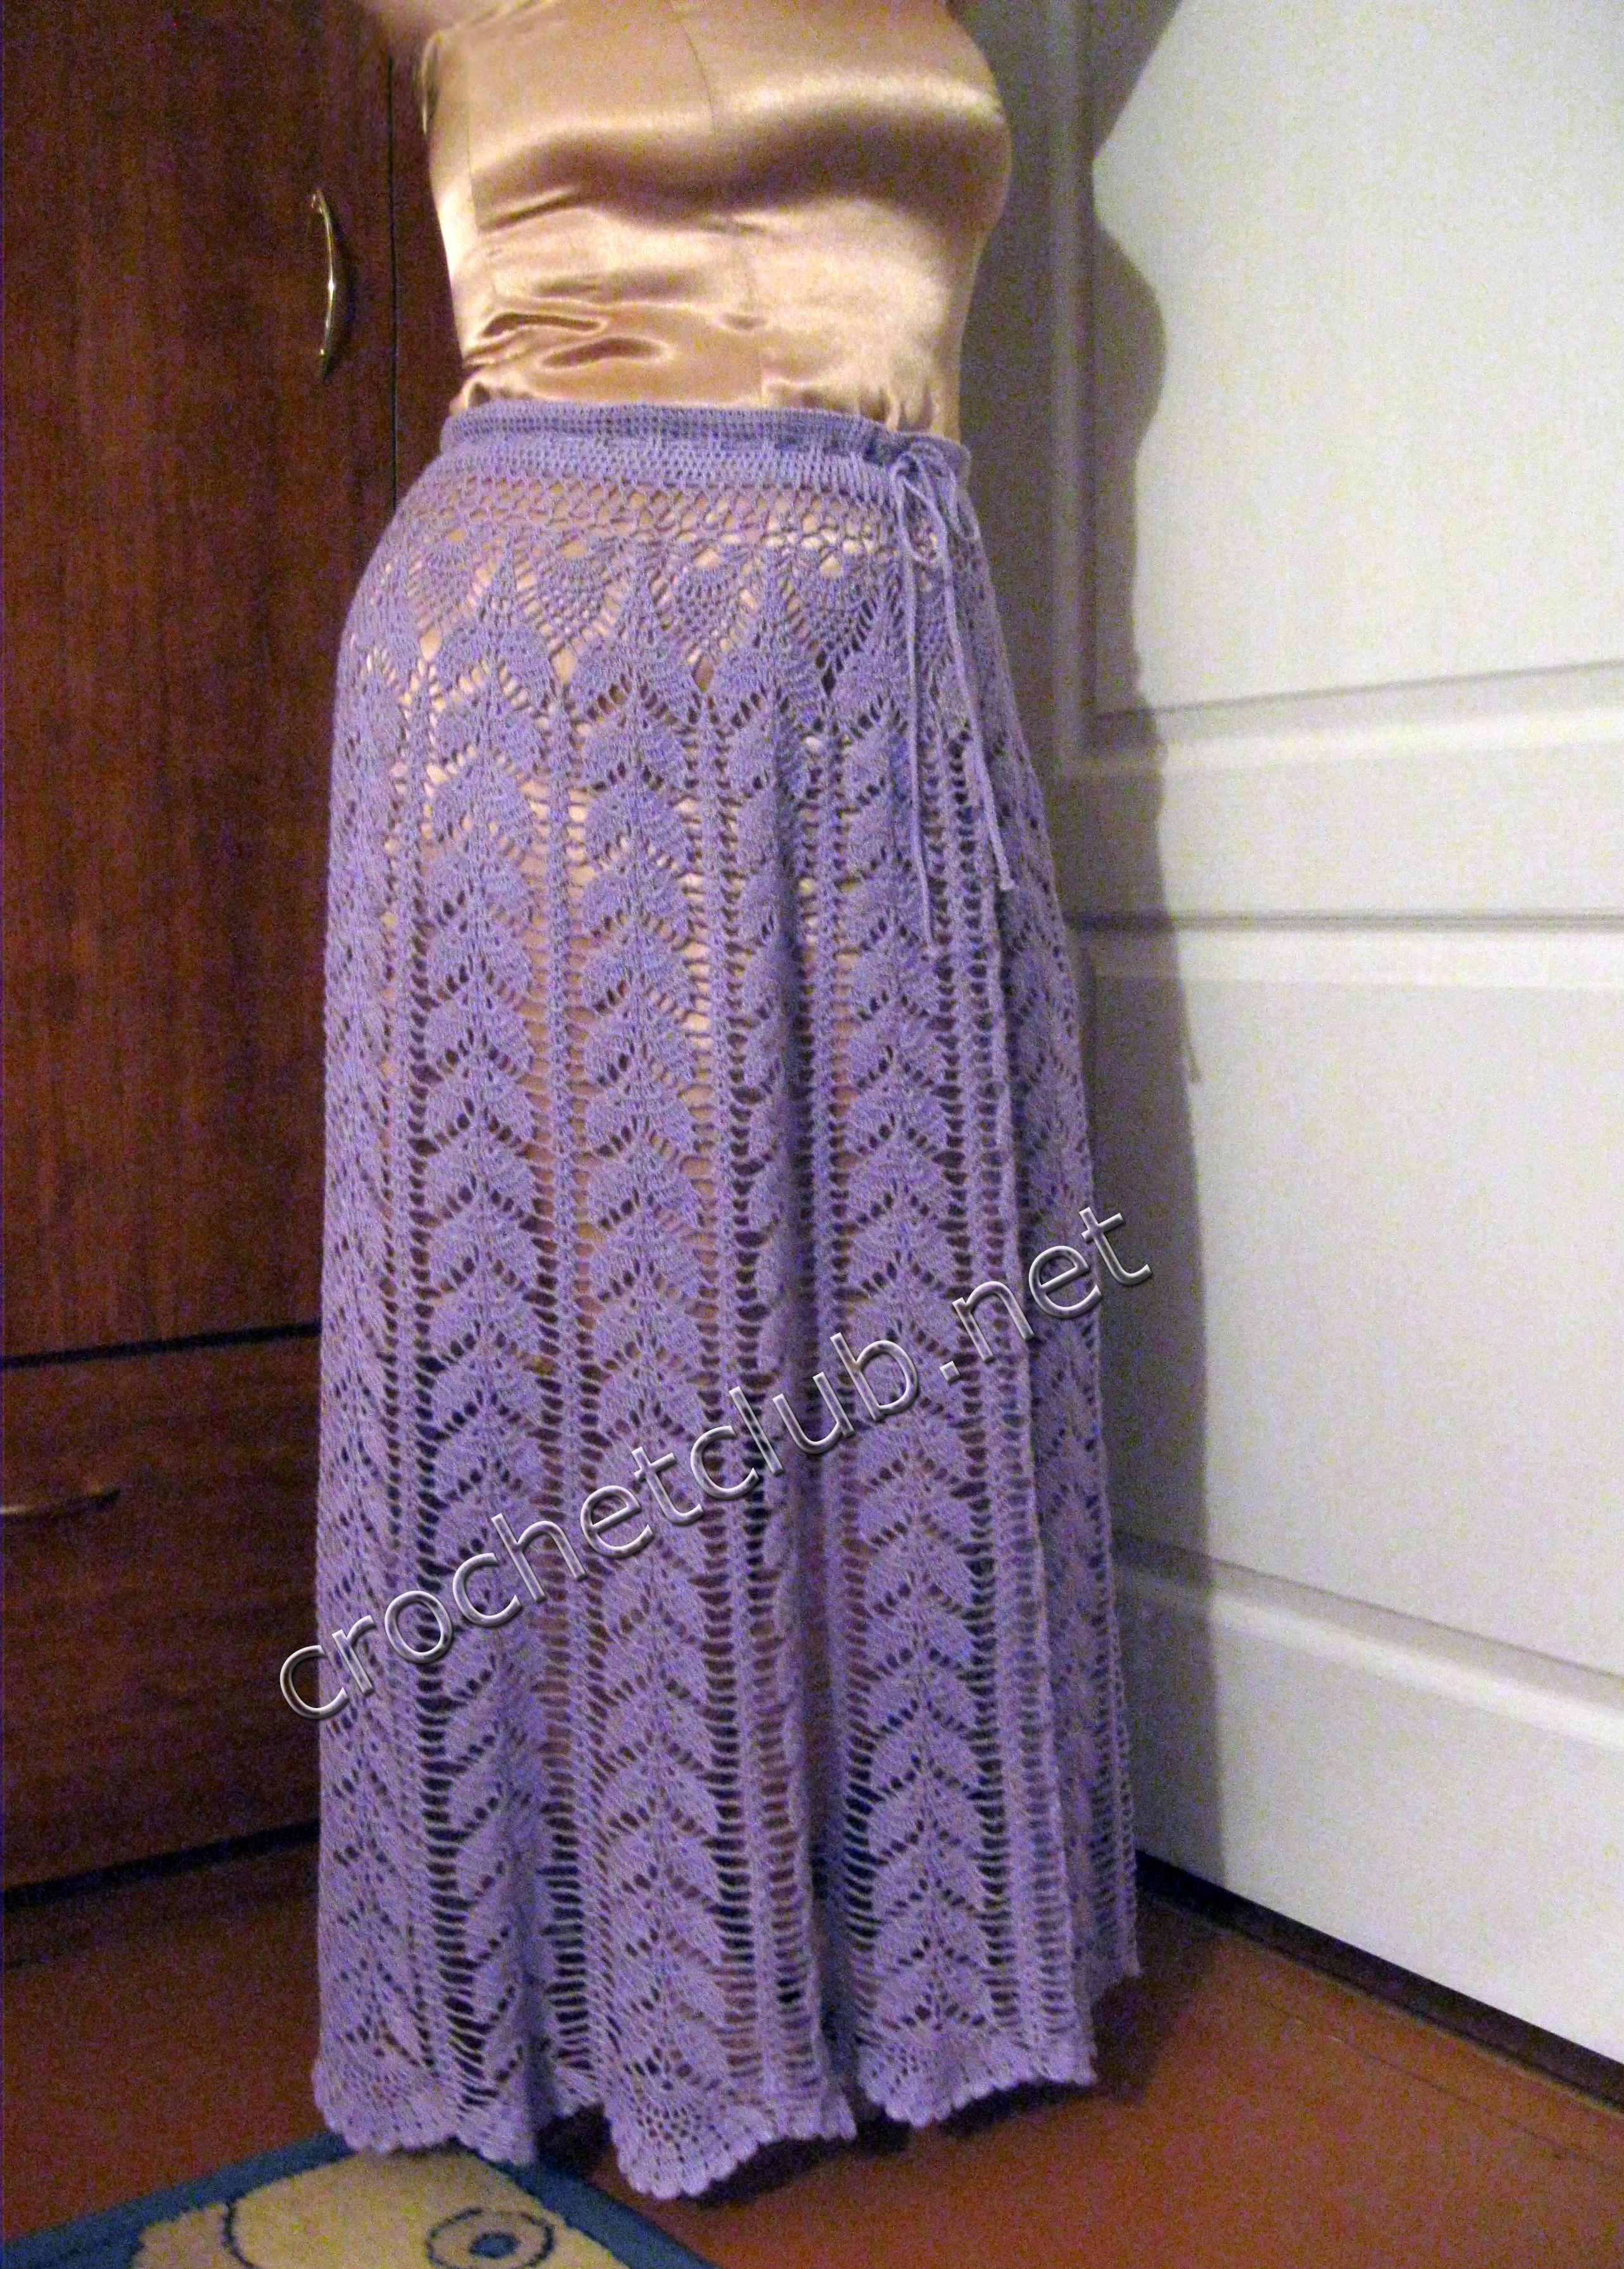 e2e1ffcb155 Вязаная юбка узором «Листики» - Вязание Крючком. Блог Настика